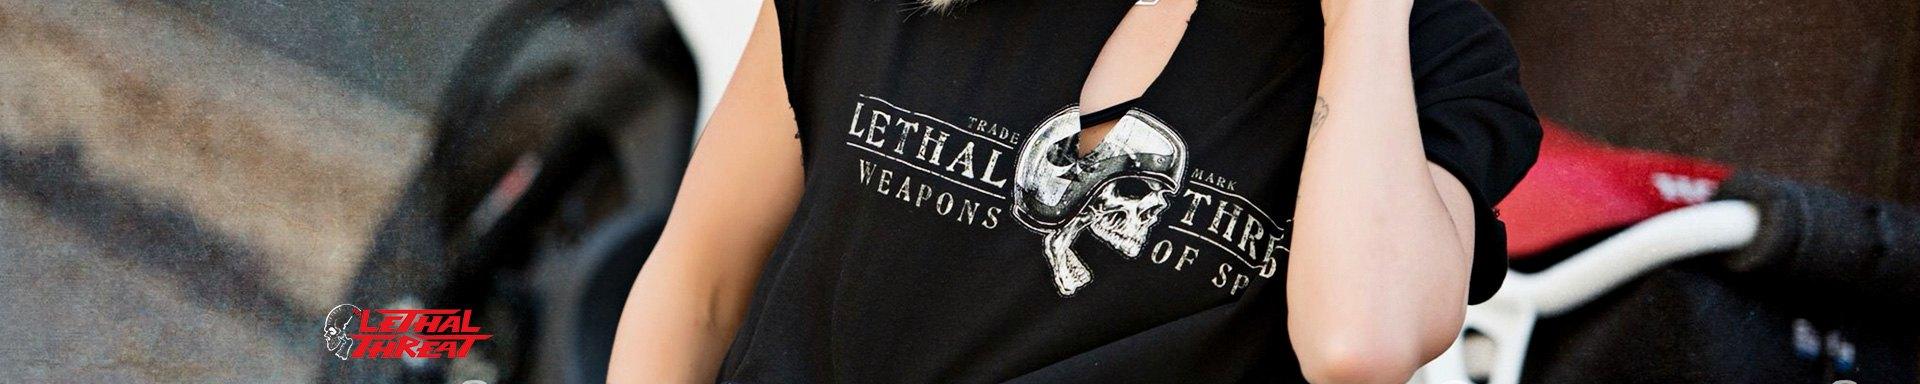 Black, X-Large JP60202XL Womens Sugar Skull Tank Top Lethal Threat